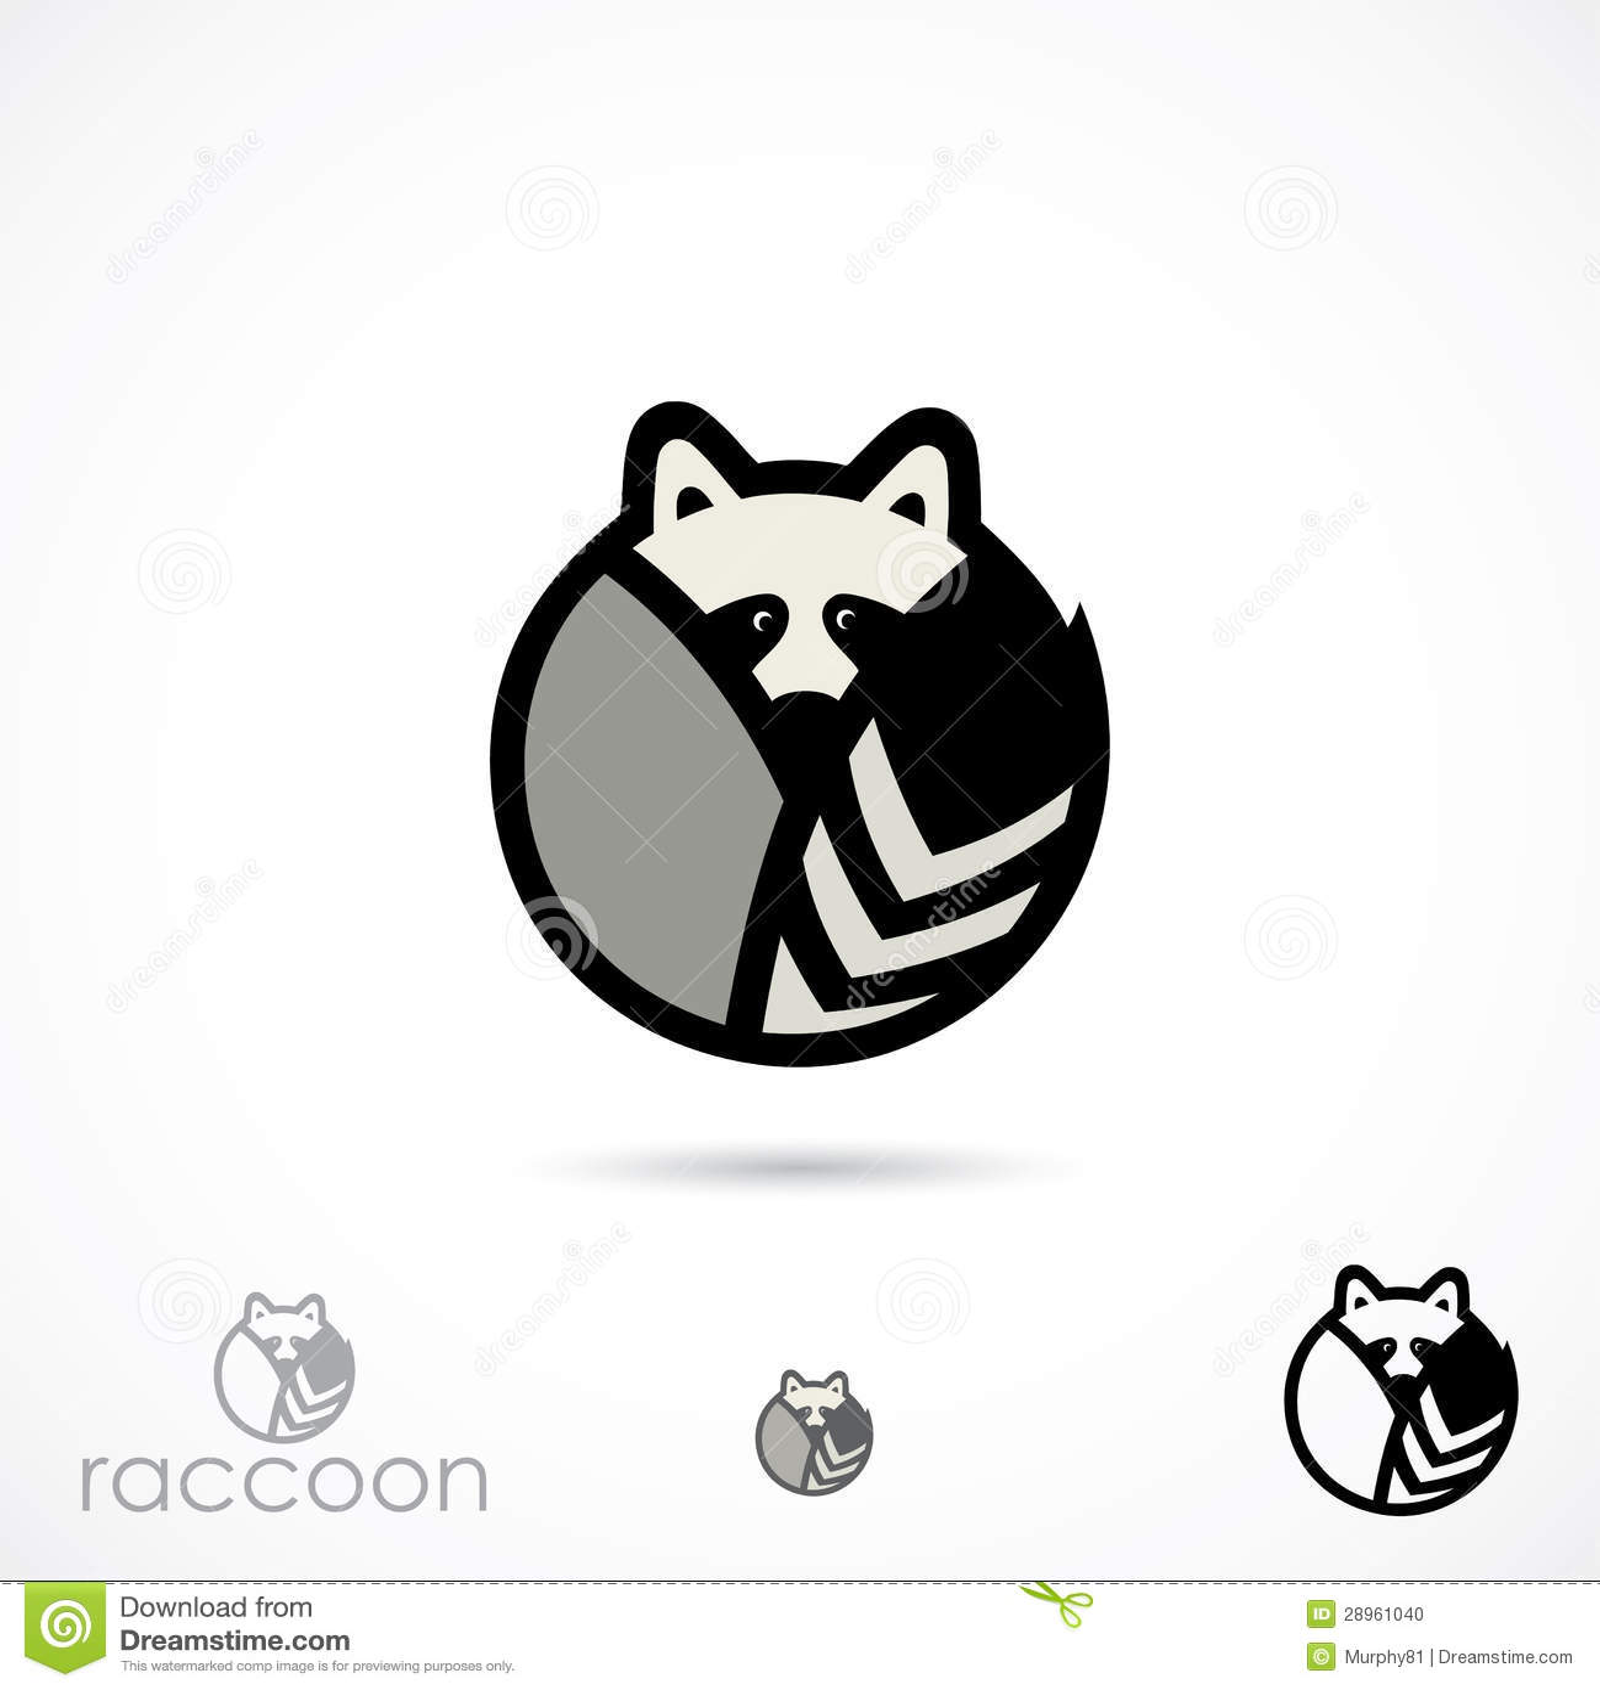 Raccoon Symbol Stock Photo - Image: 28961040